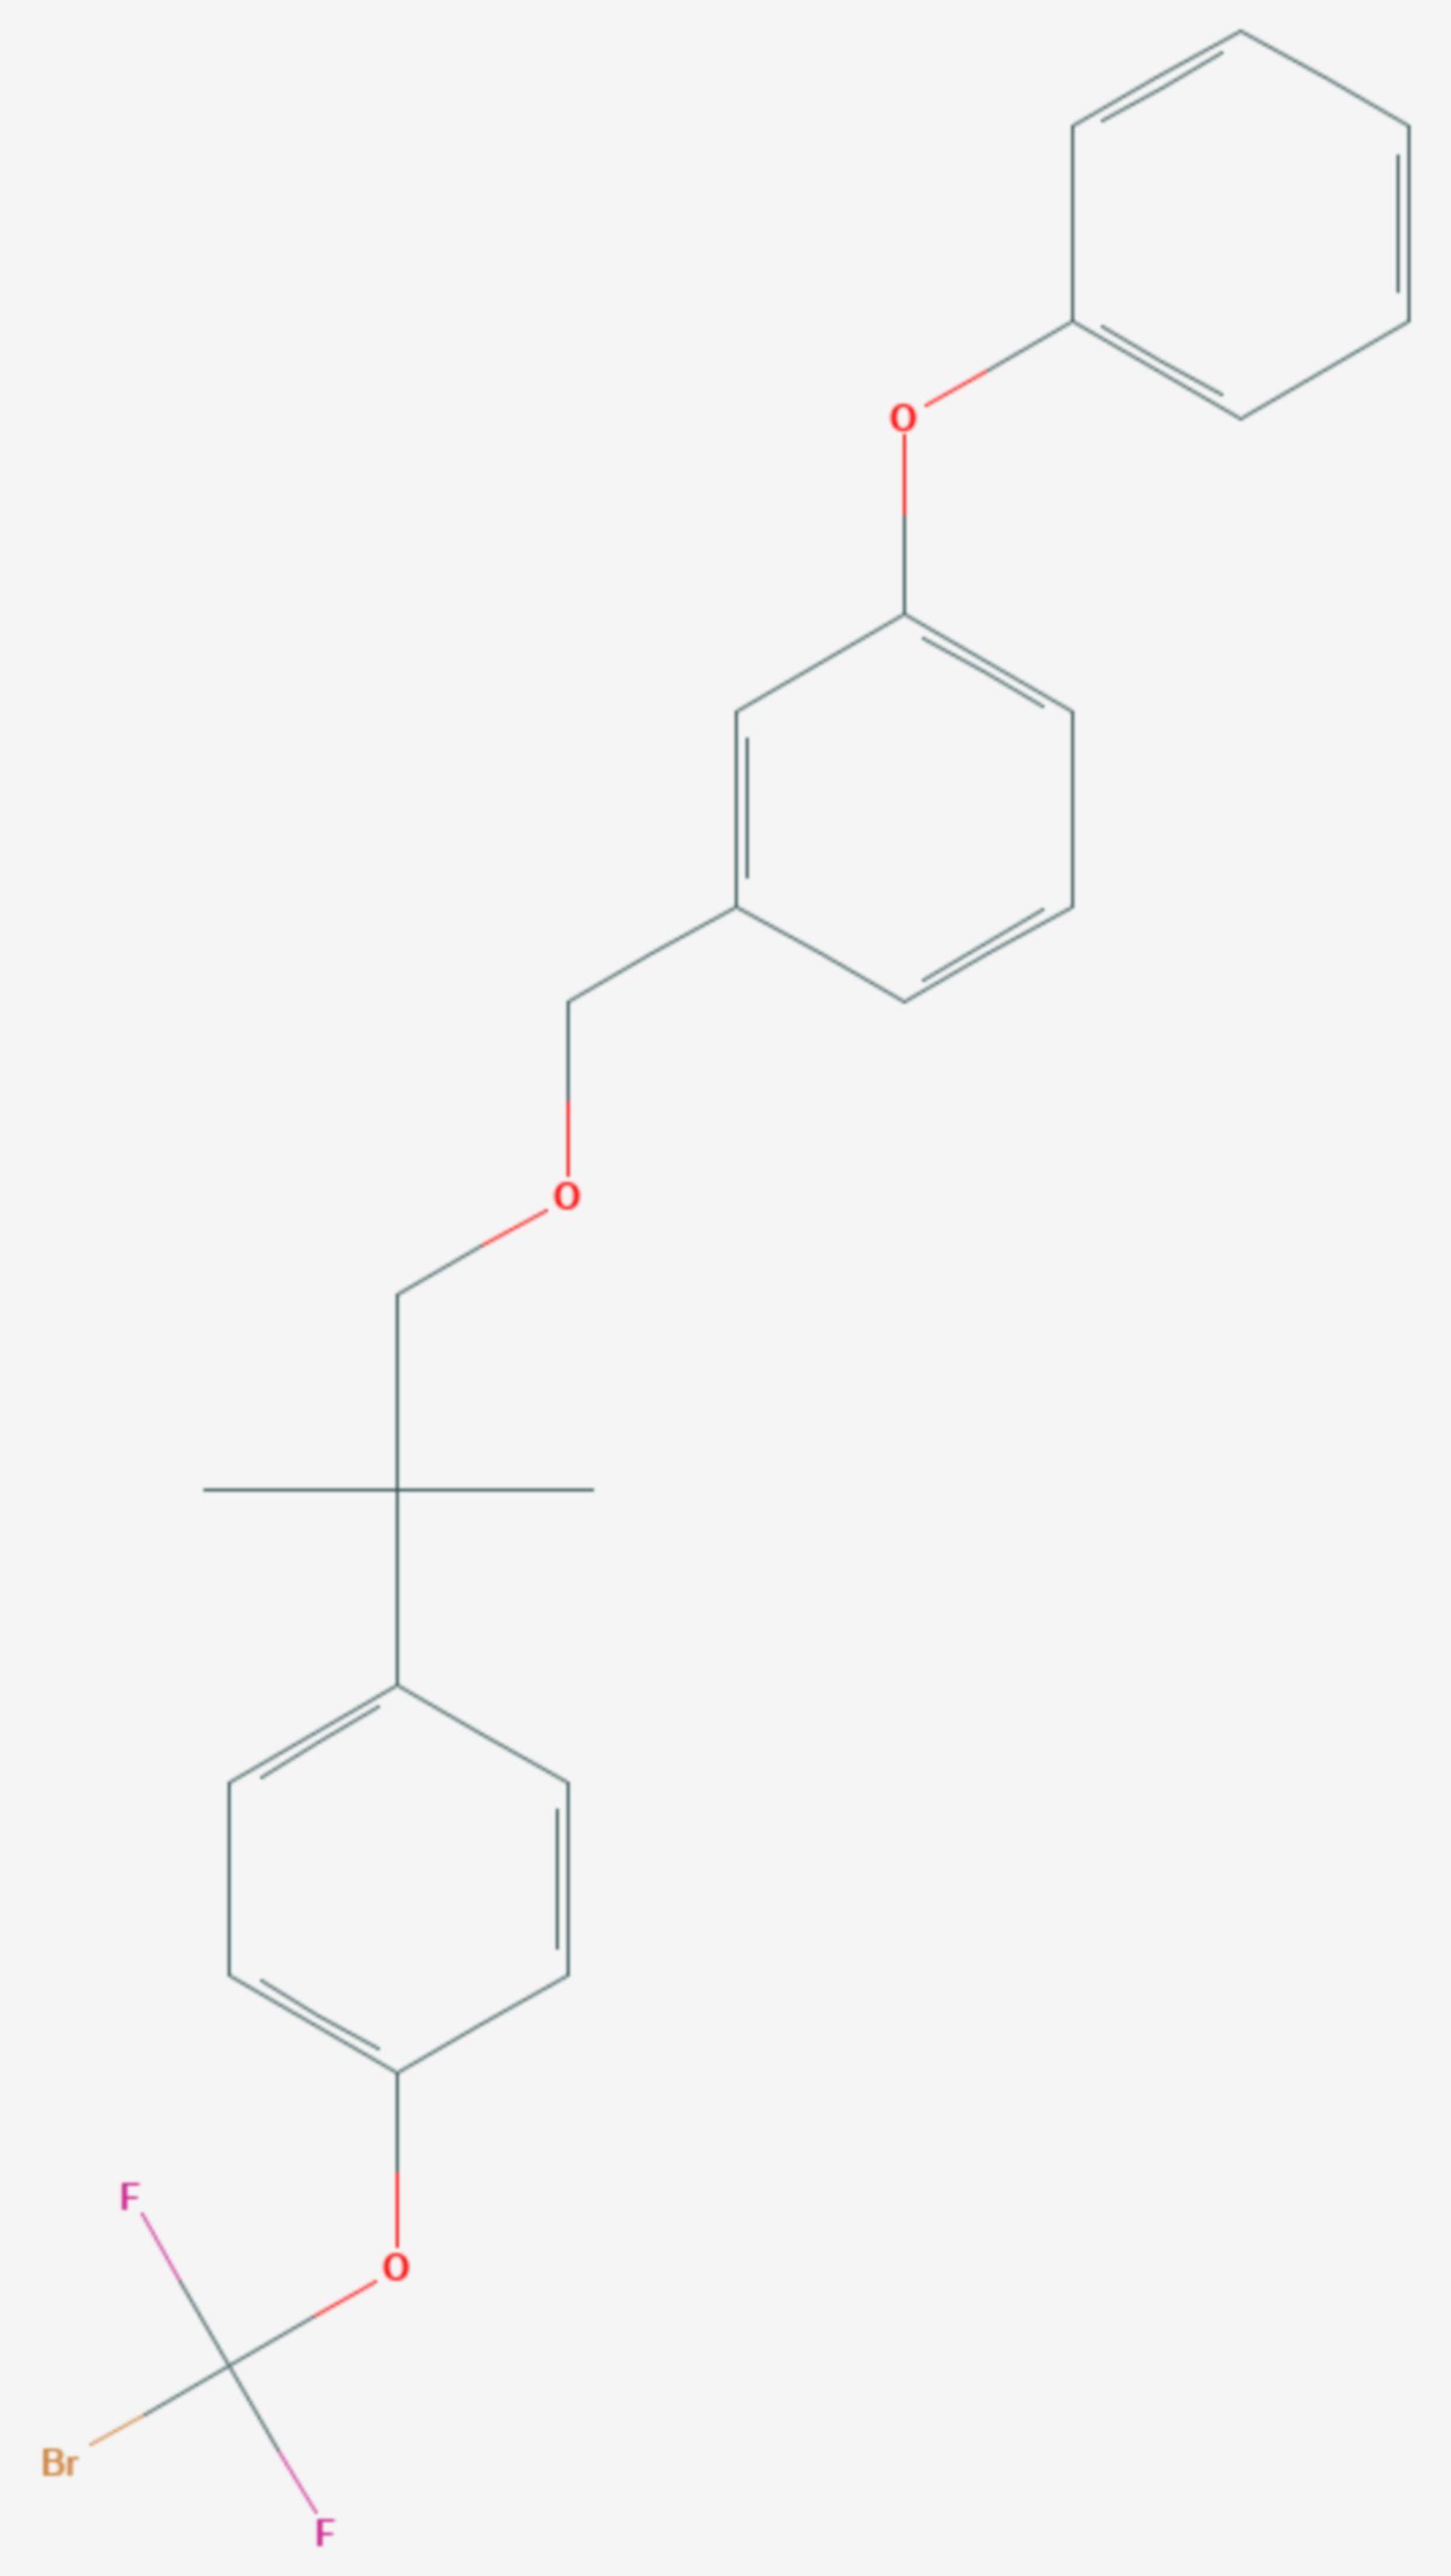 Halfenprox (Strukturformel)